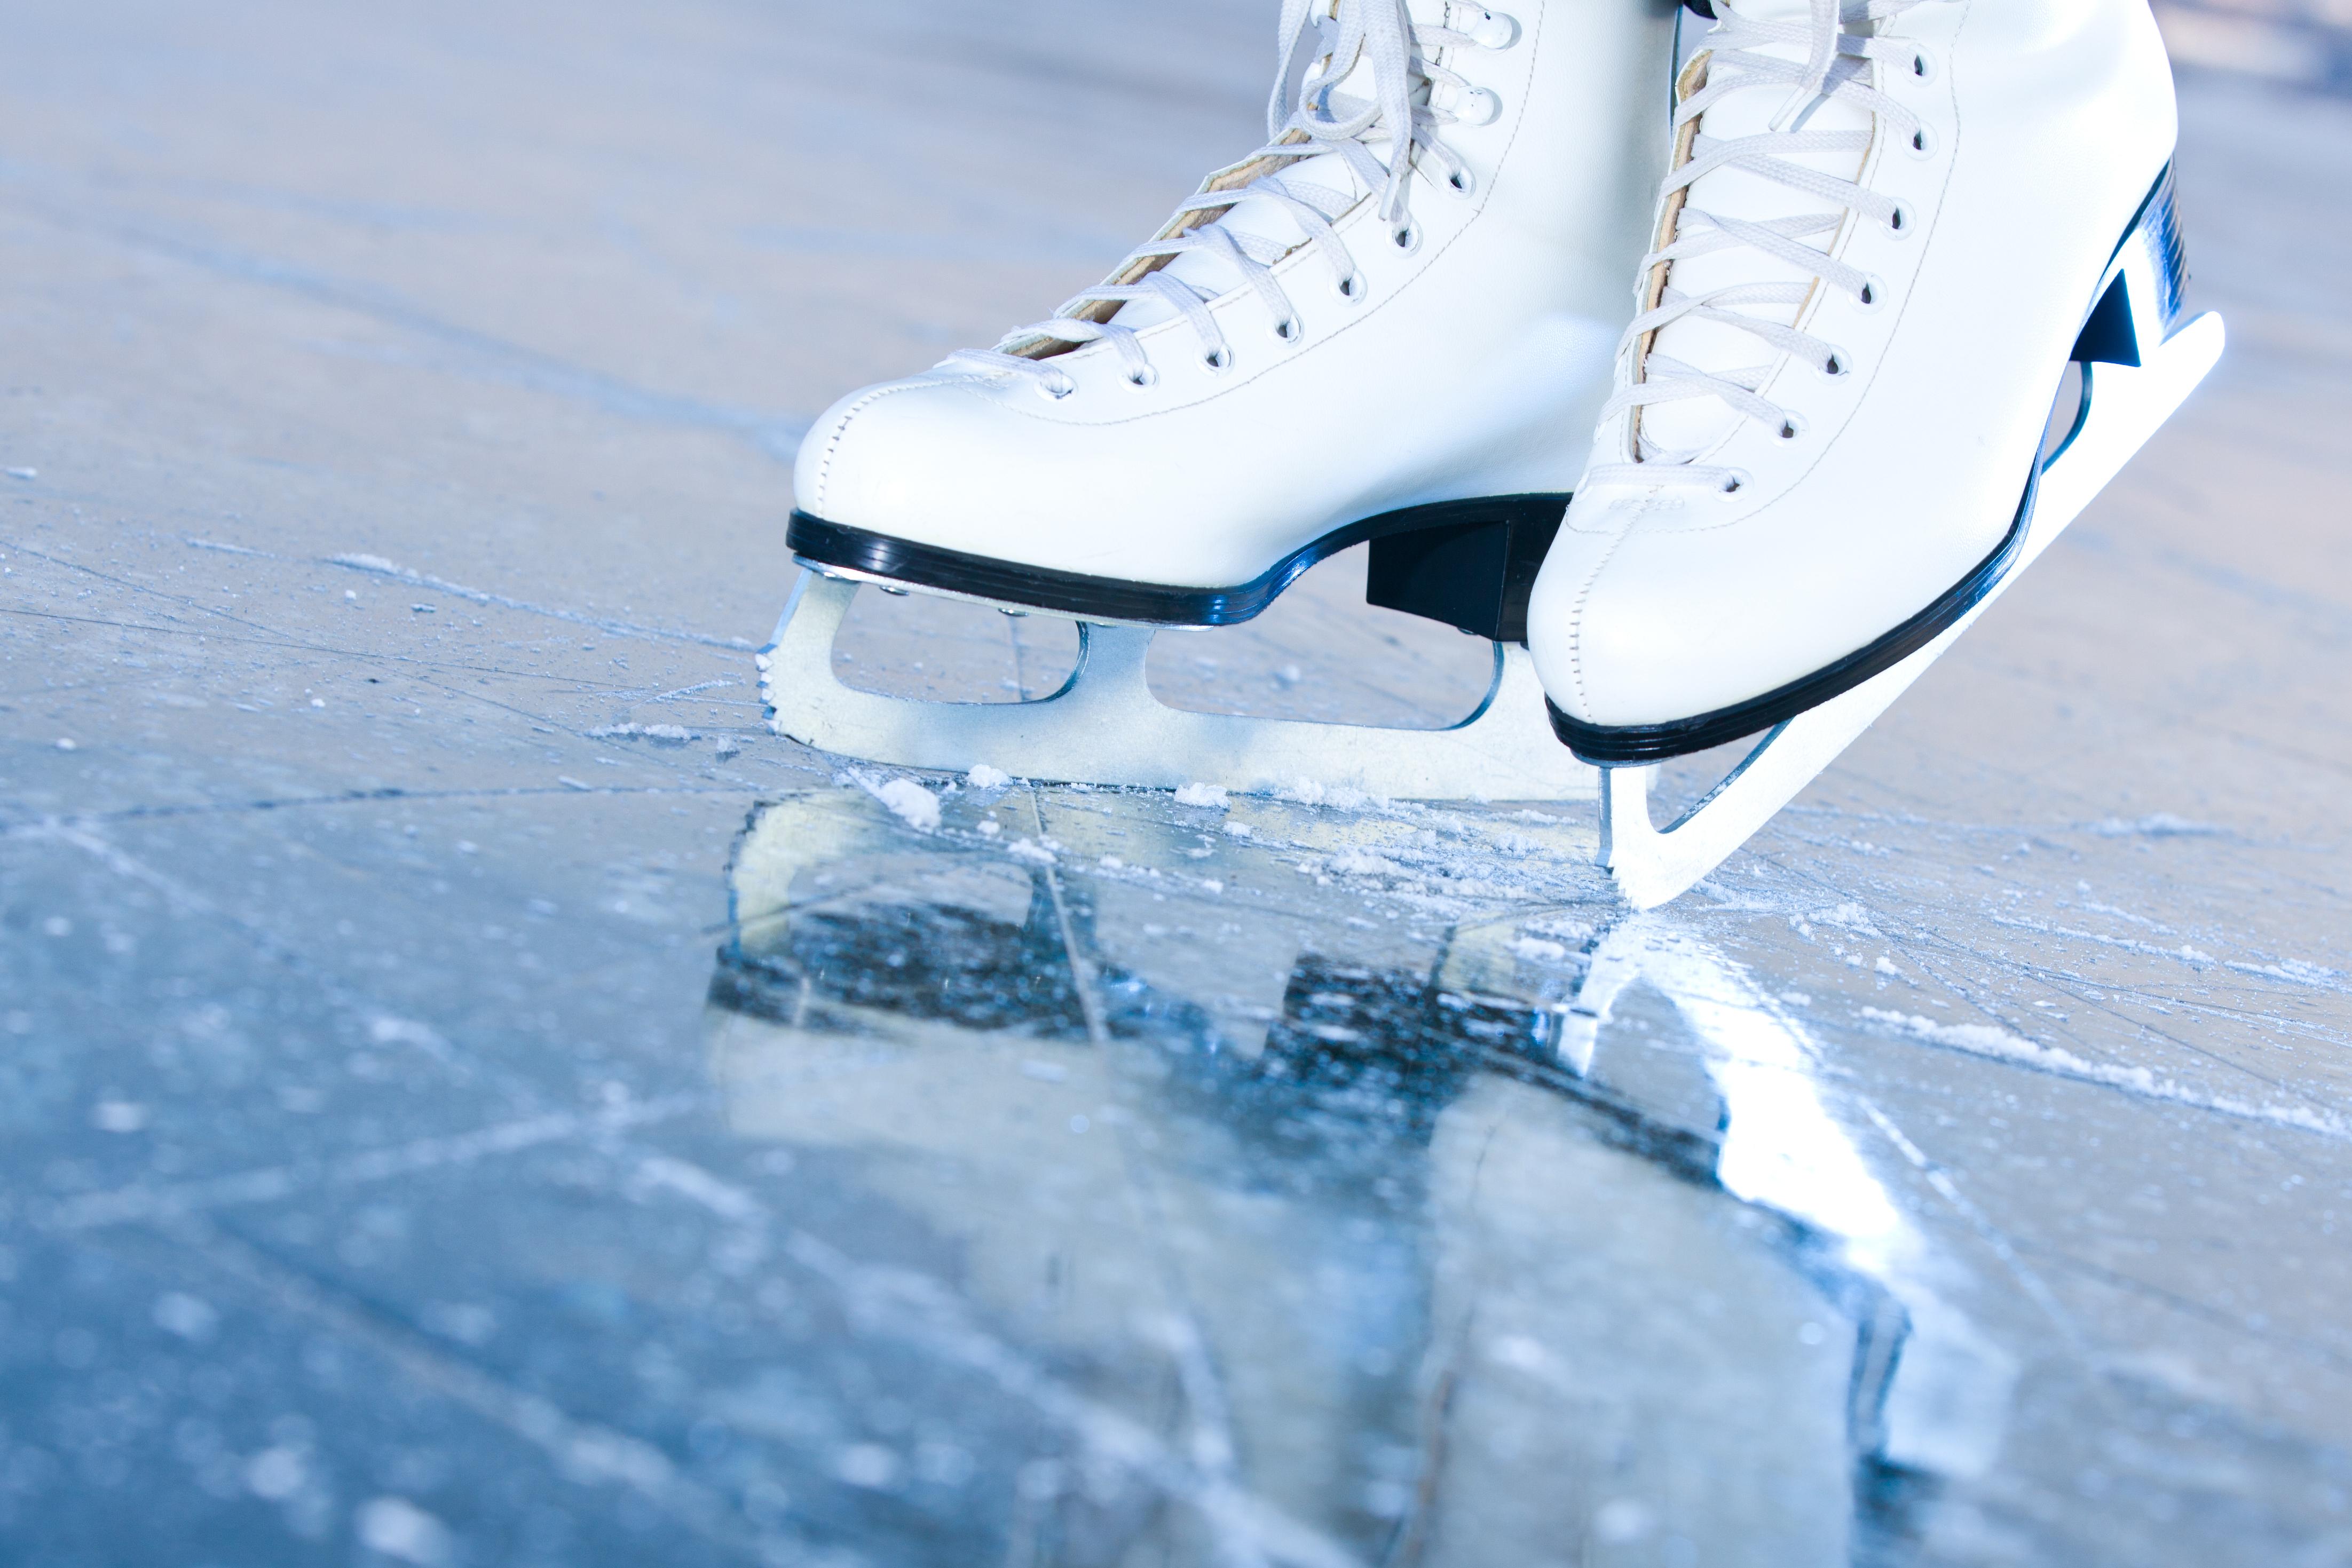 HQ Figure Skating Wallpapers | File 6706.84Kb